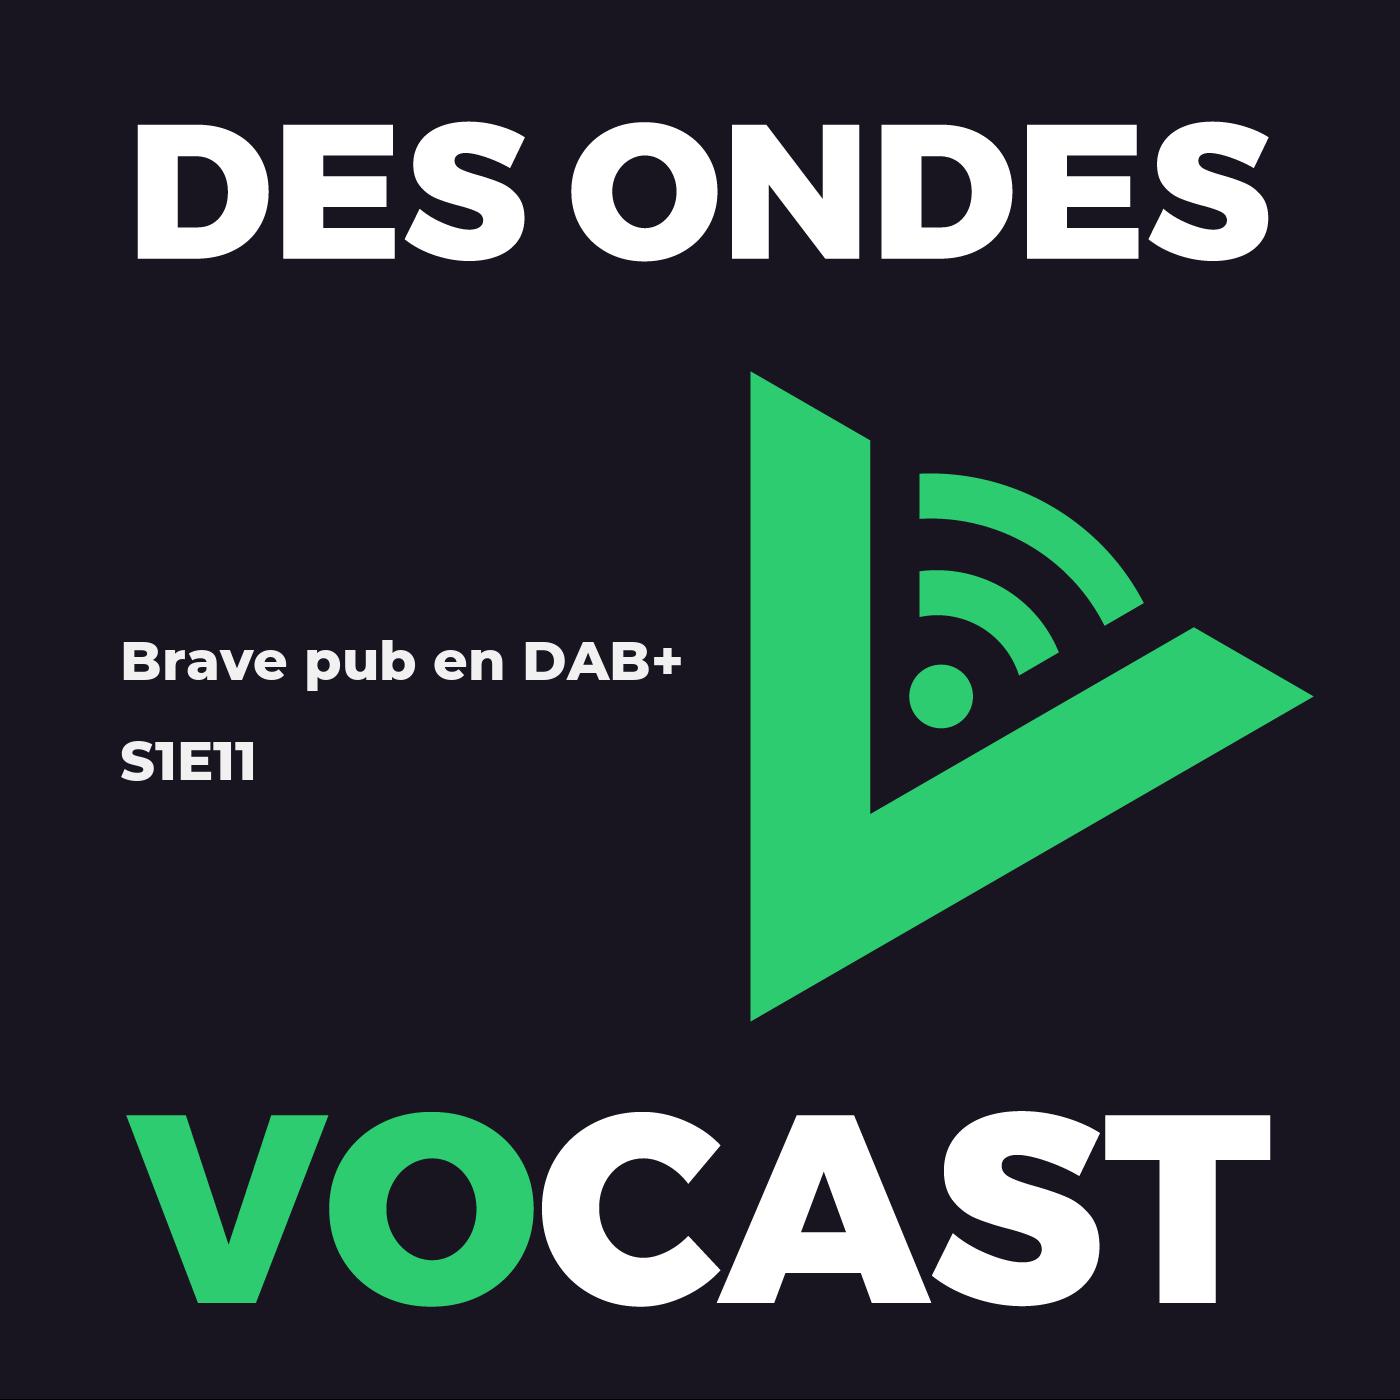 Brave pub en DAB+